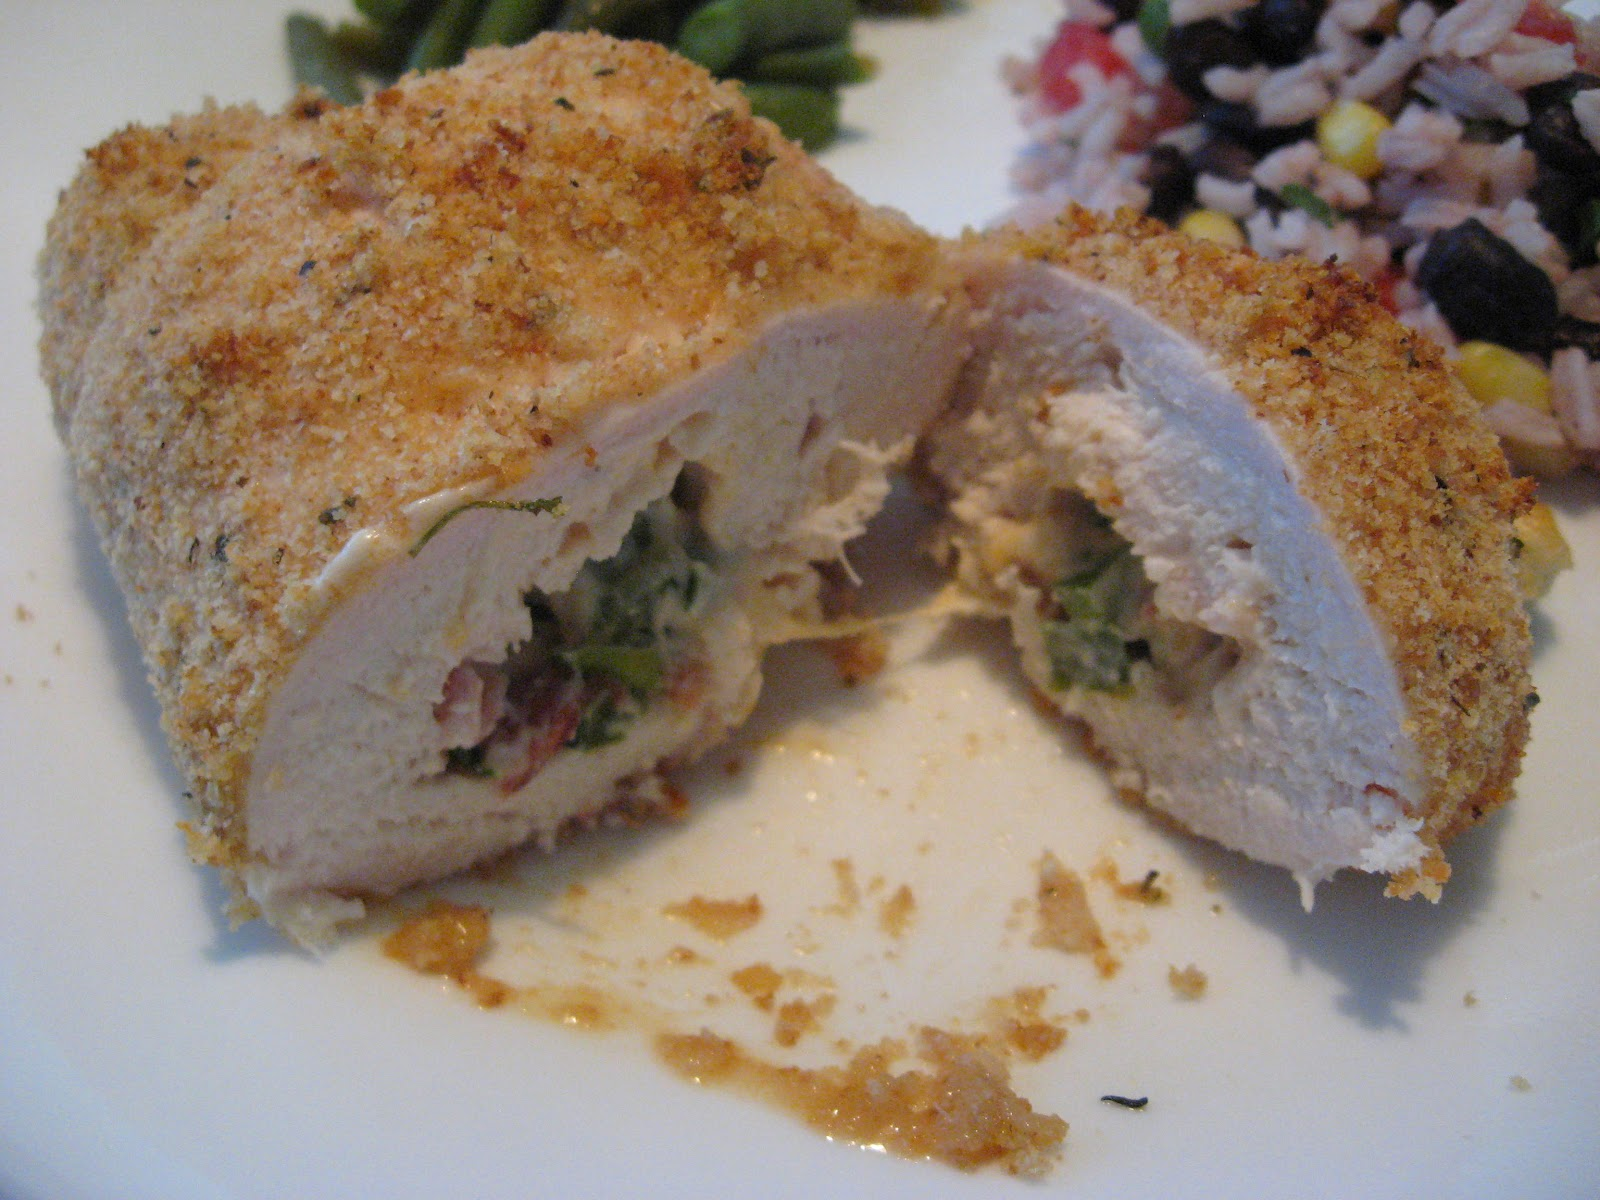 Yummy to My Tummy: Cheesy Jalapeño Popper Baked Stuffed Chicken